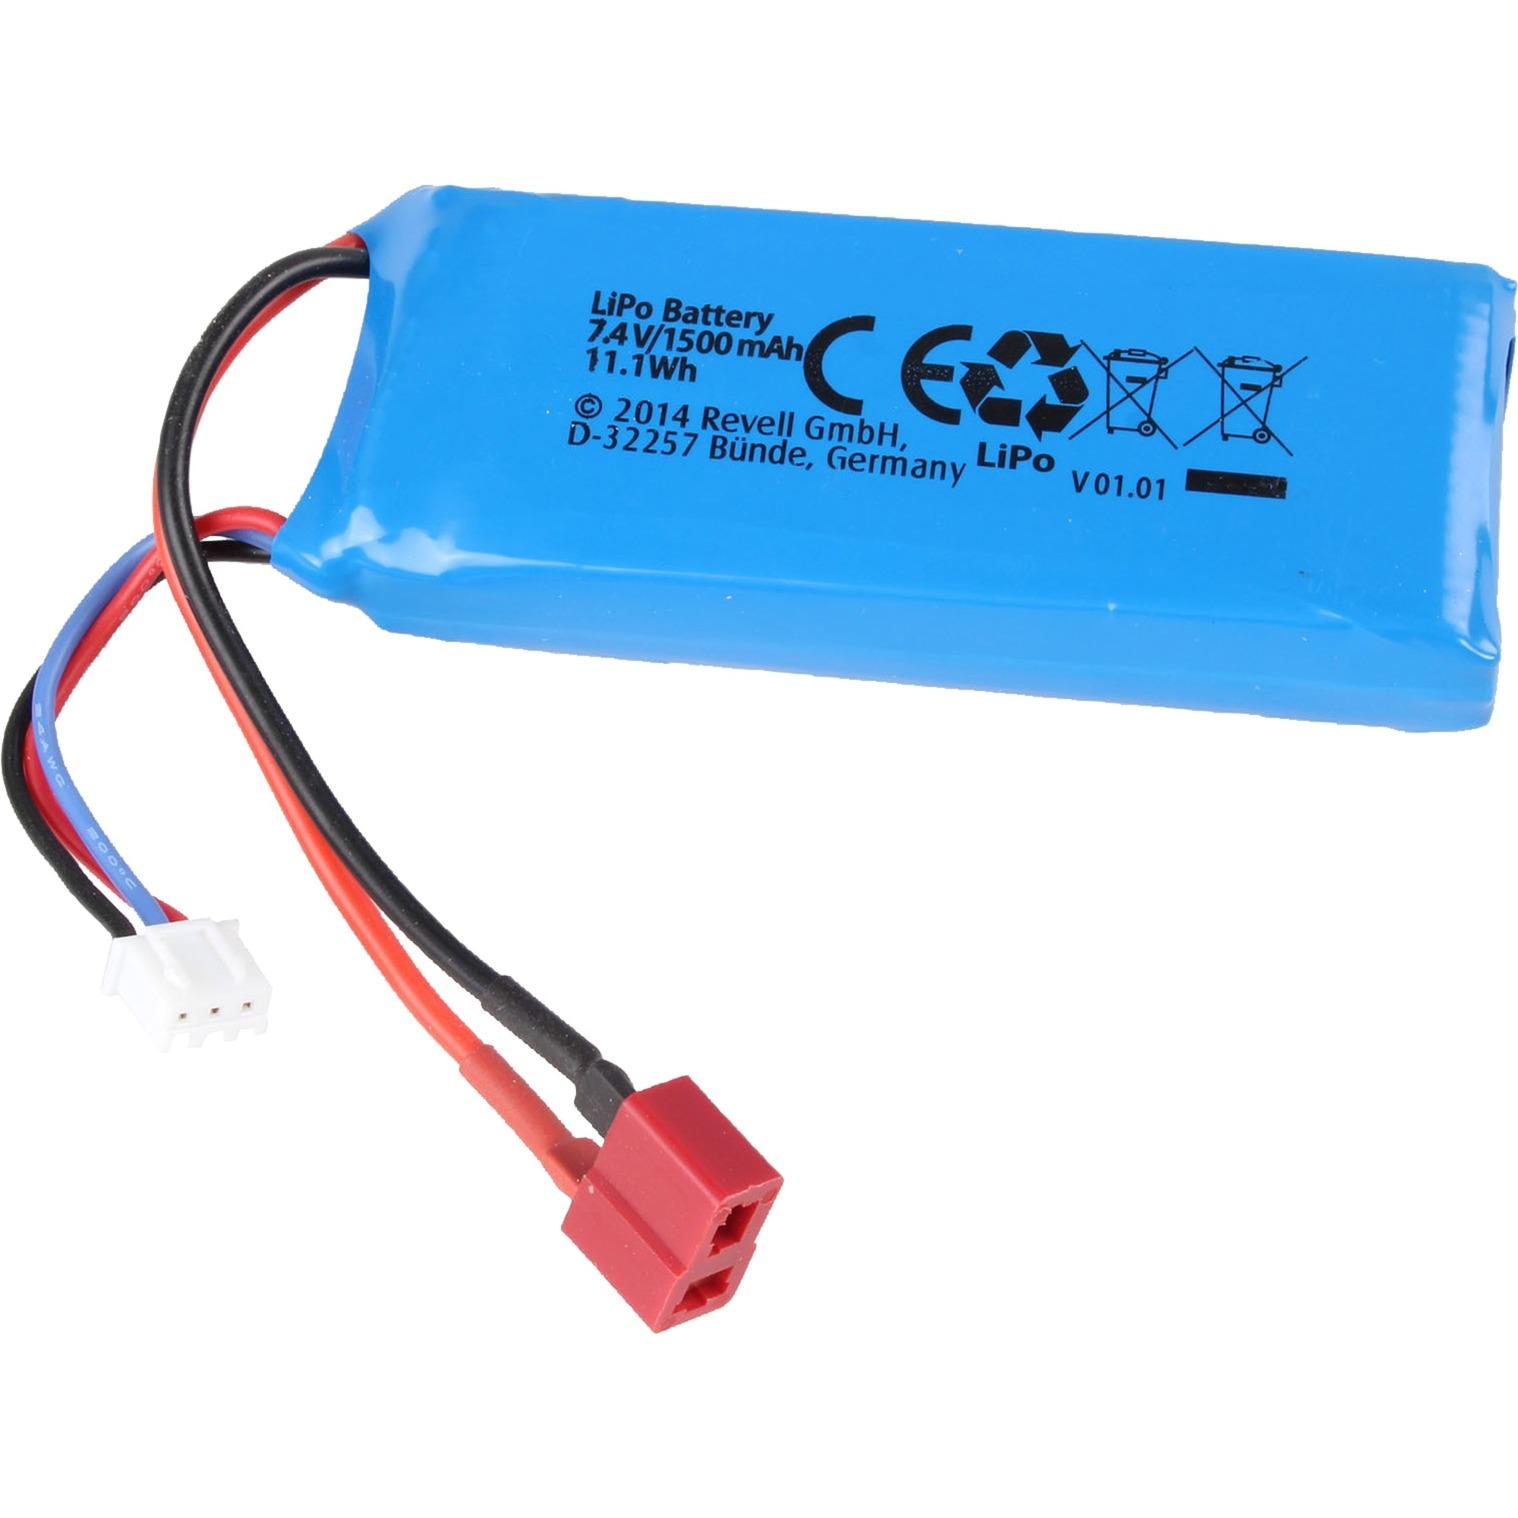 23961, Droner batteri